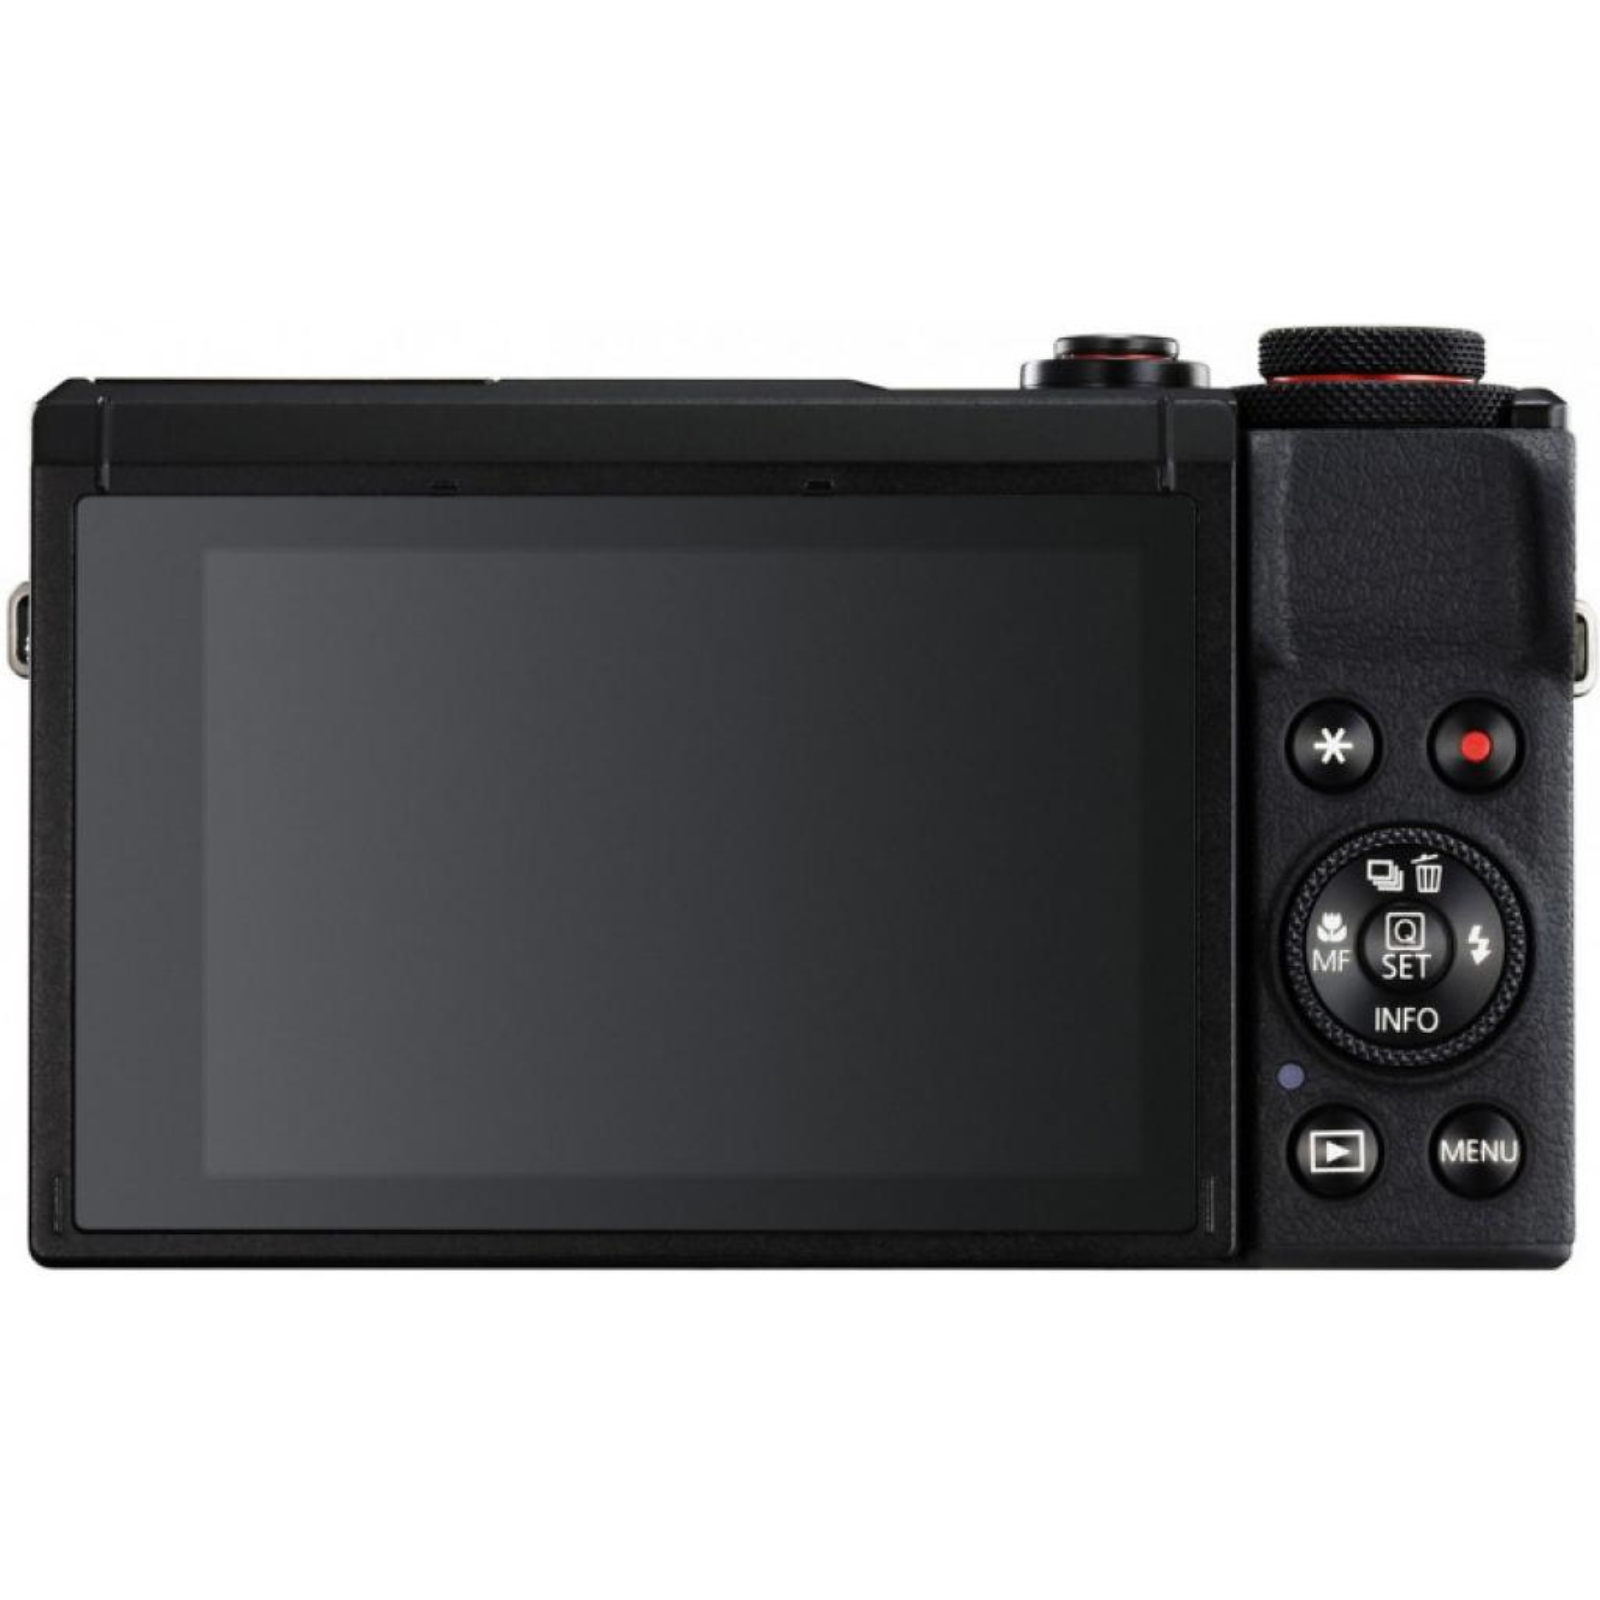 Цифровой фотоаппарат Canon Powershot G7 X Mark III Black (3637C013) изображение 6